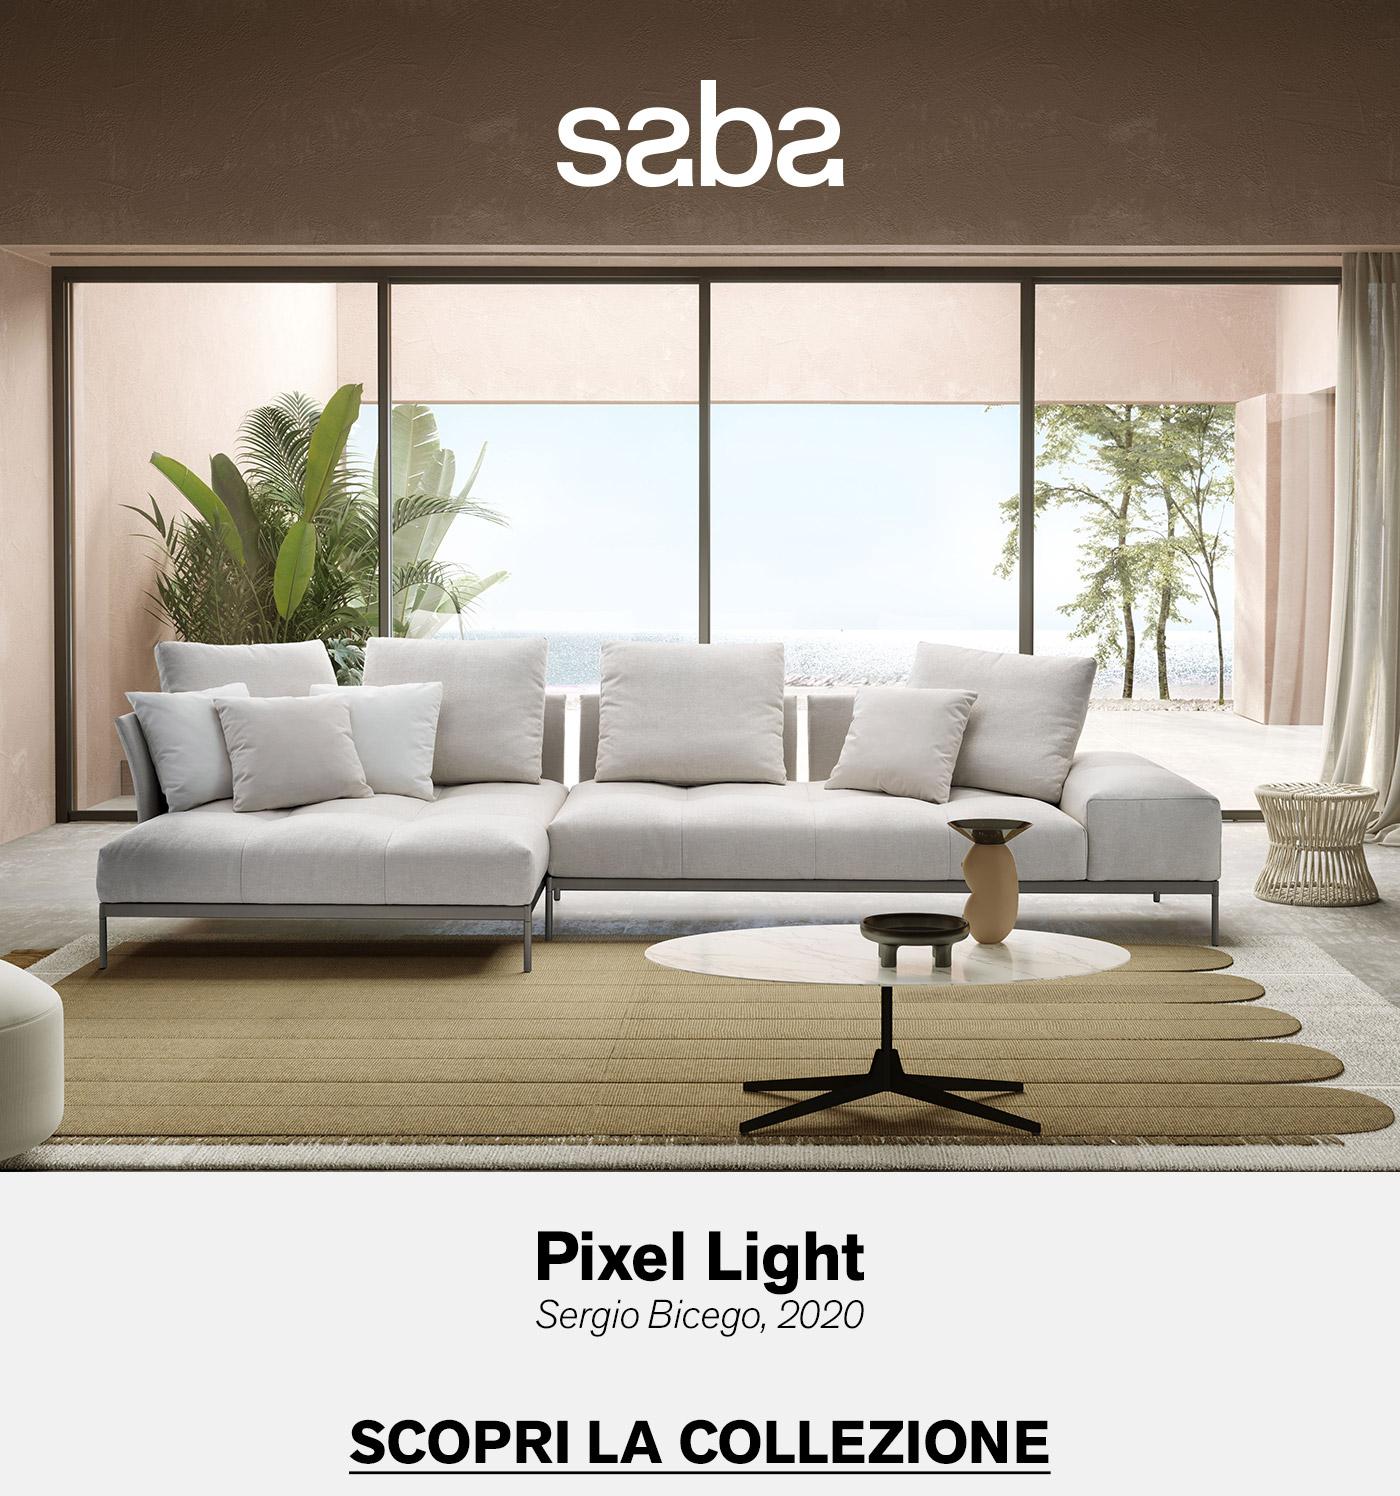 Saba Pixel Light